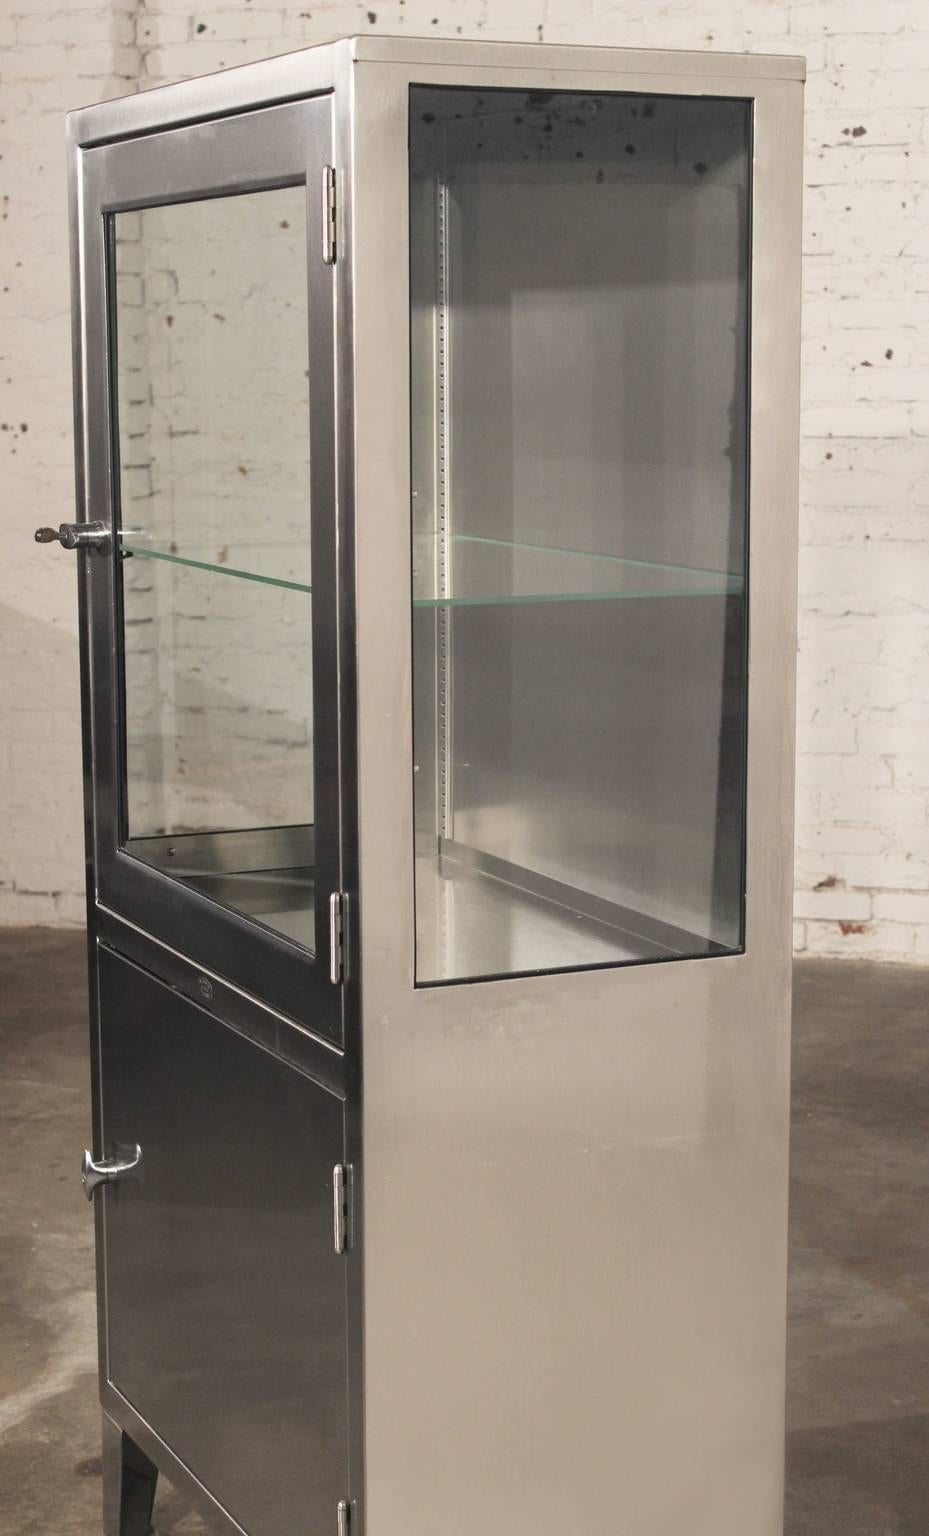 Beau Vintage Stainless Steel Lighted Industrial Or Medical Display Cabinet At  1stdibs